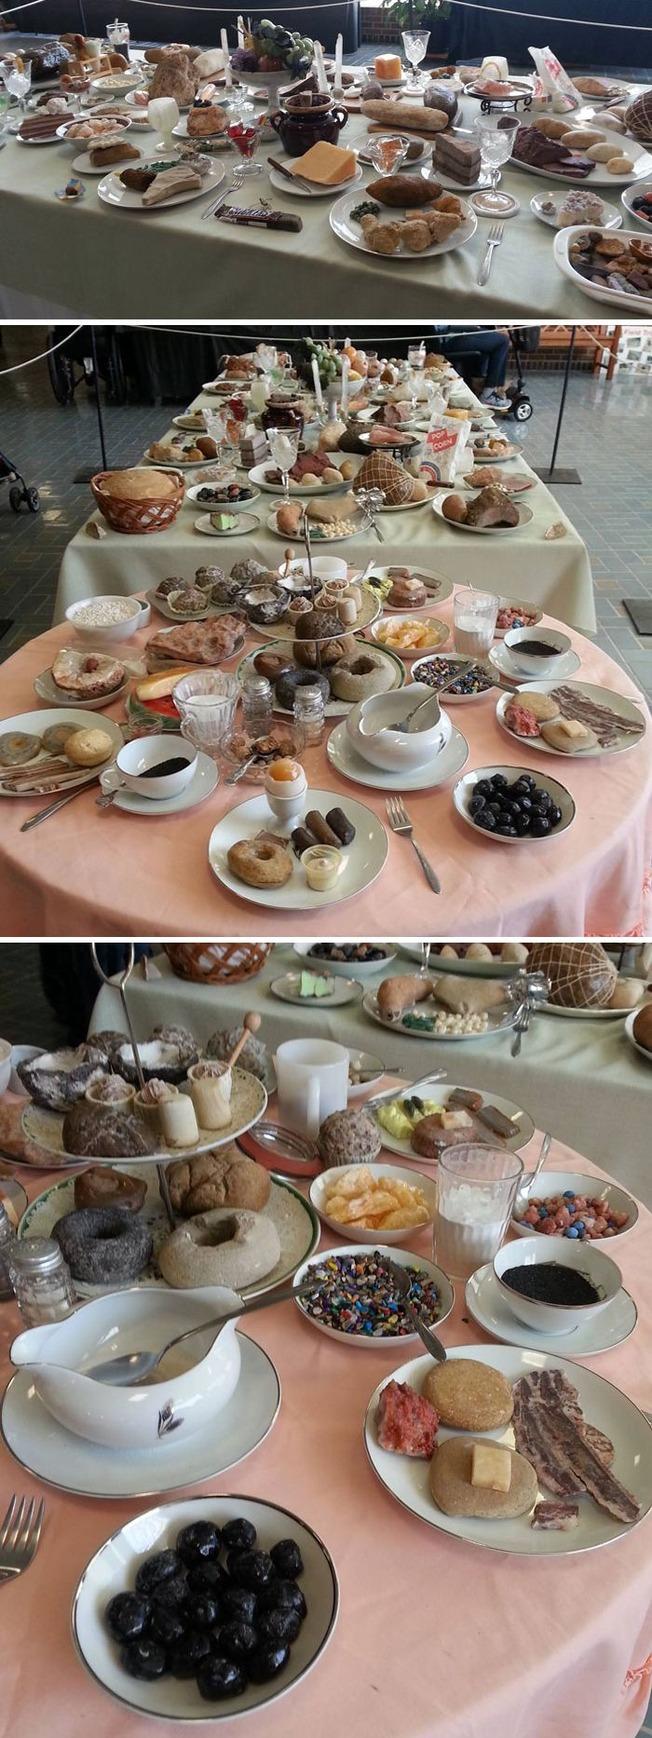 forbidden-snacks-things-look-like-food-37a-5f6b5b7633612__700